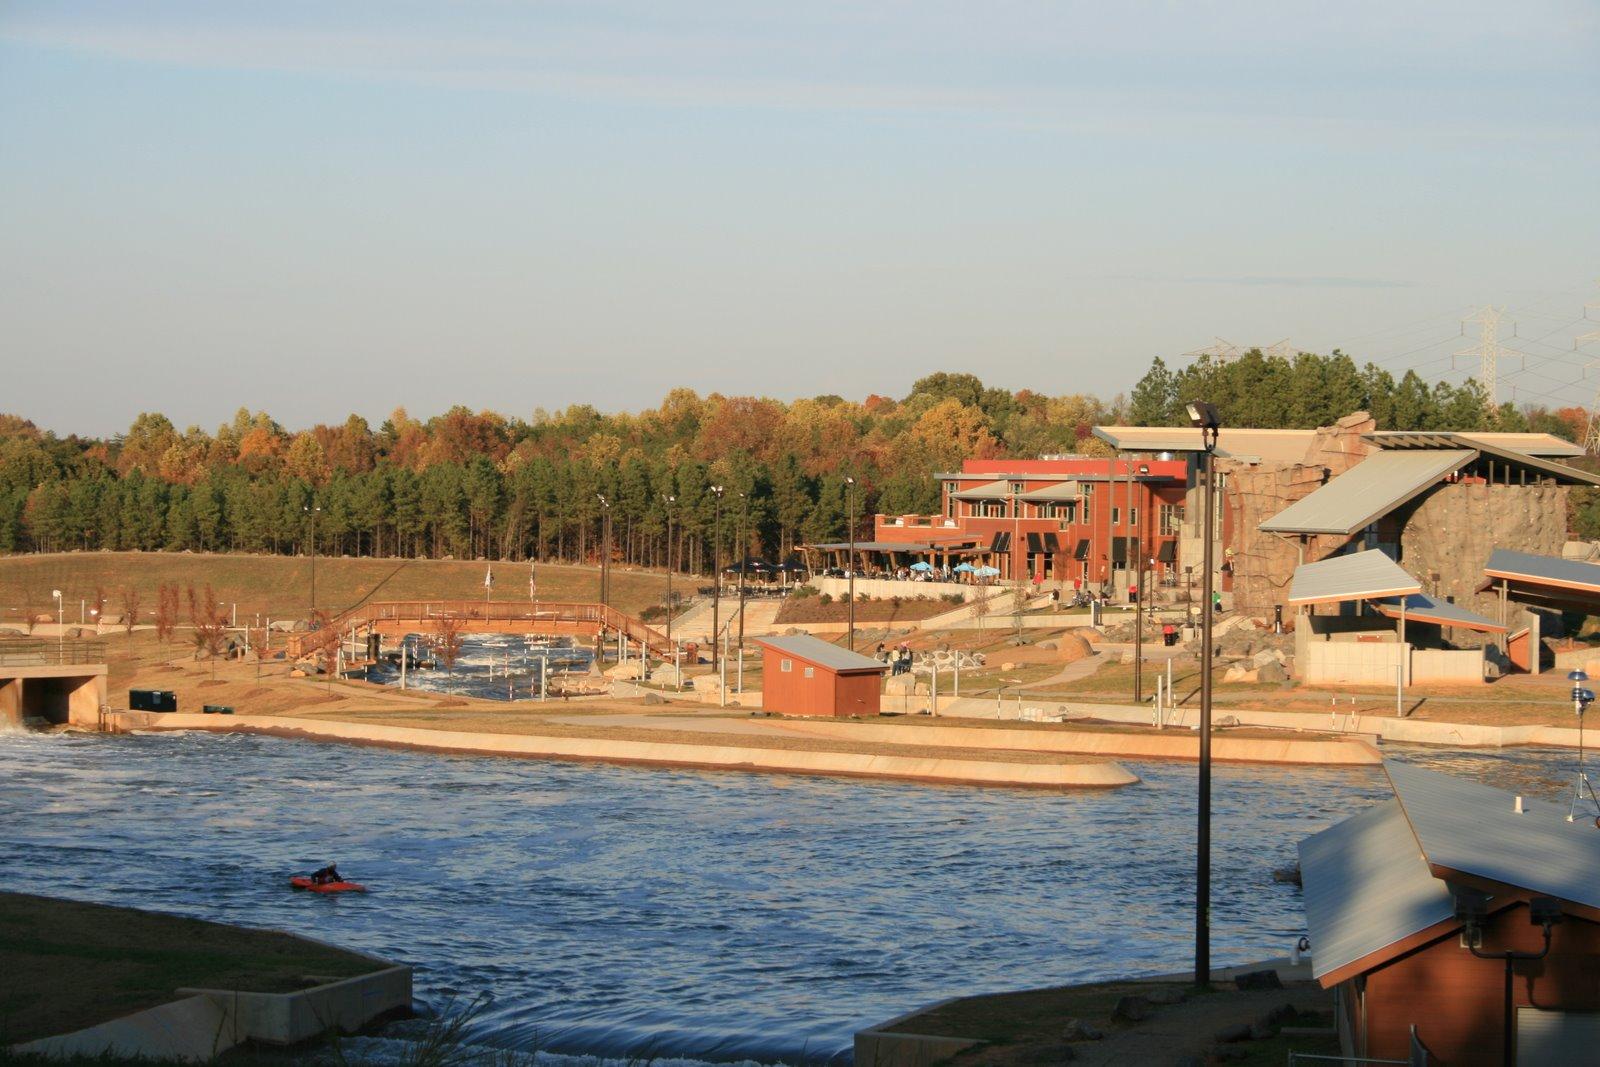 USNWC Man Made River